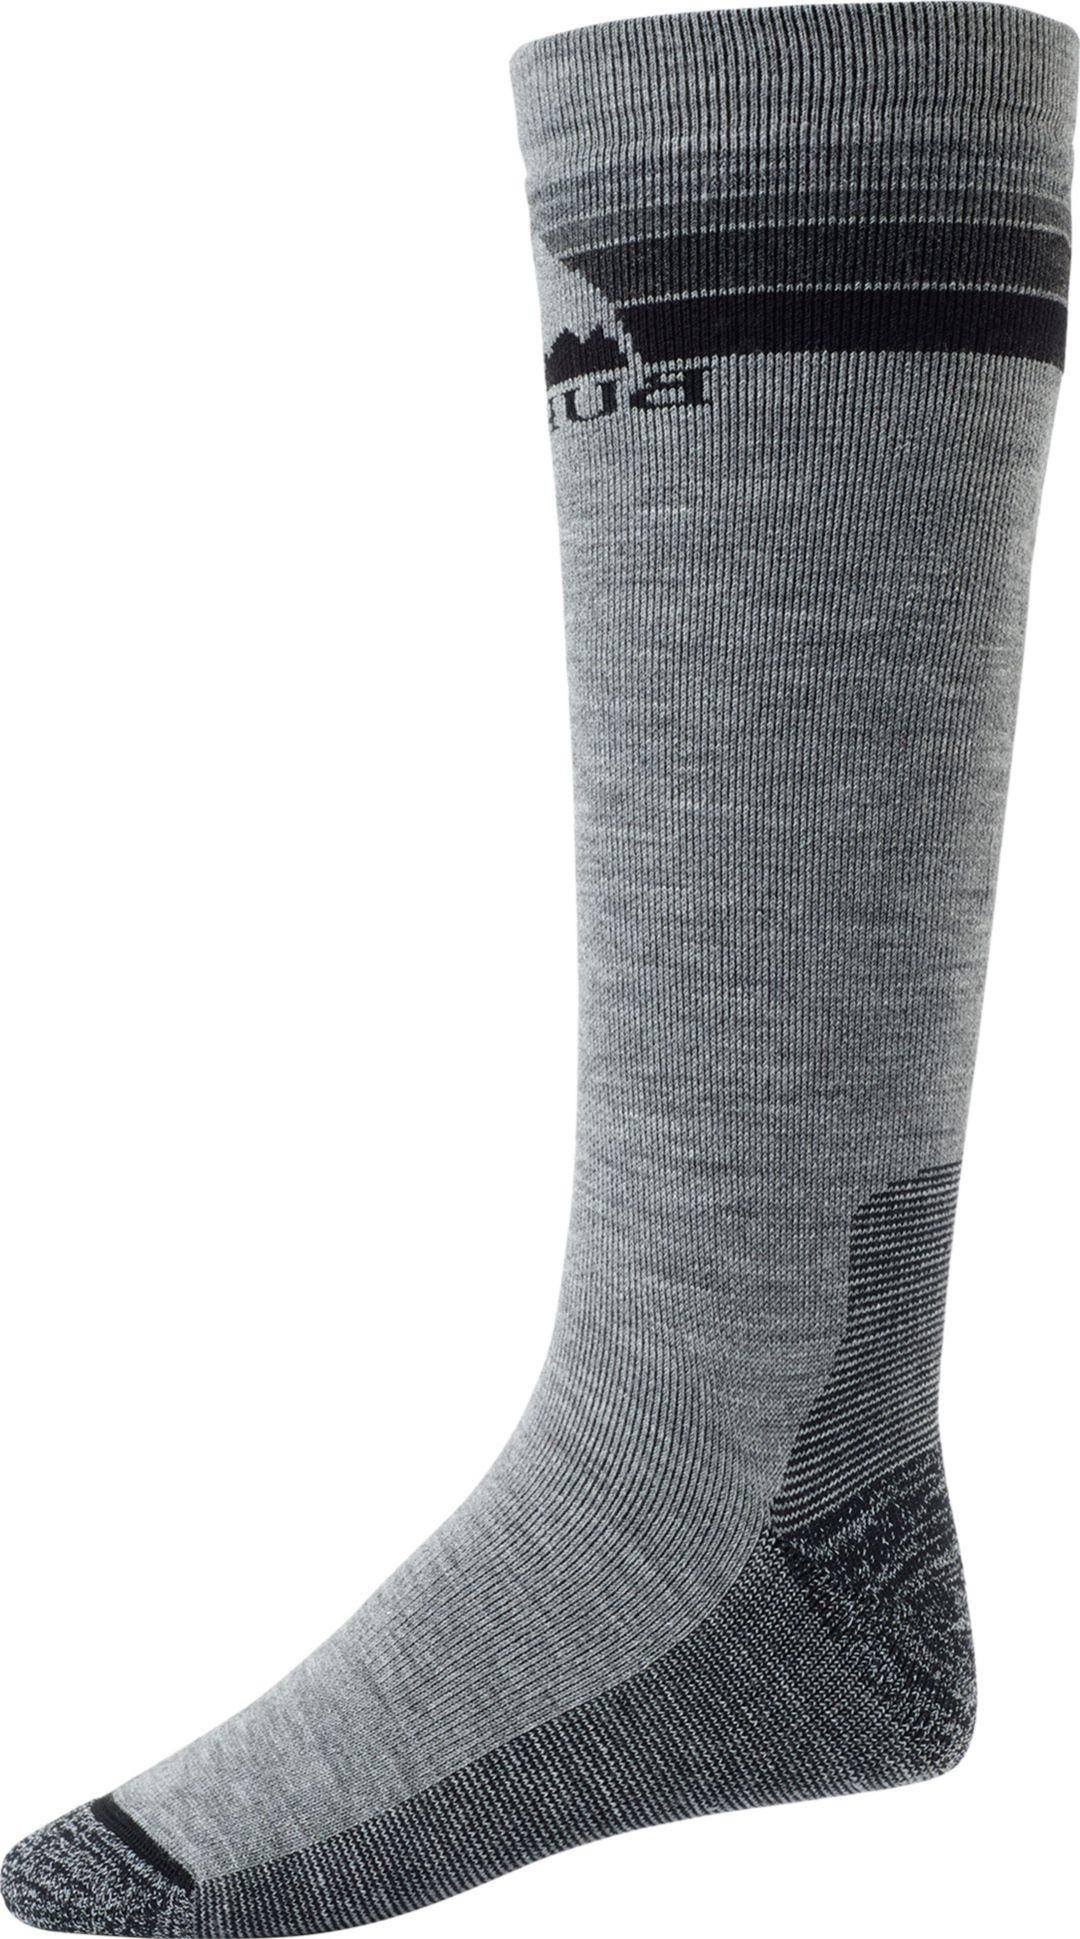 f0796d2278668 Burton Men's Emblem Midweight Socks   DICK'S Sporting Goods